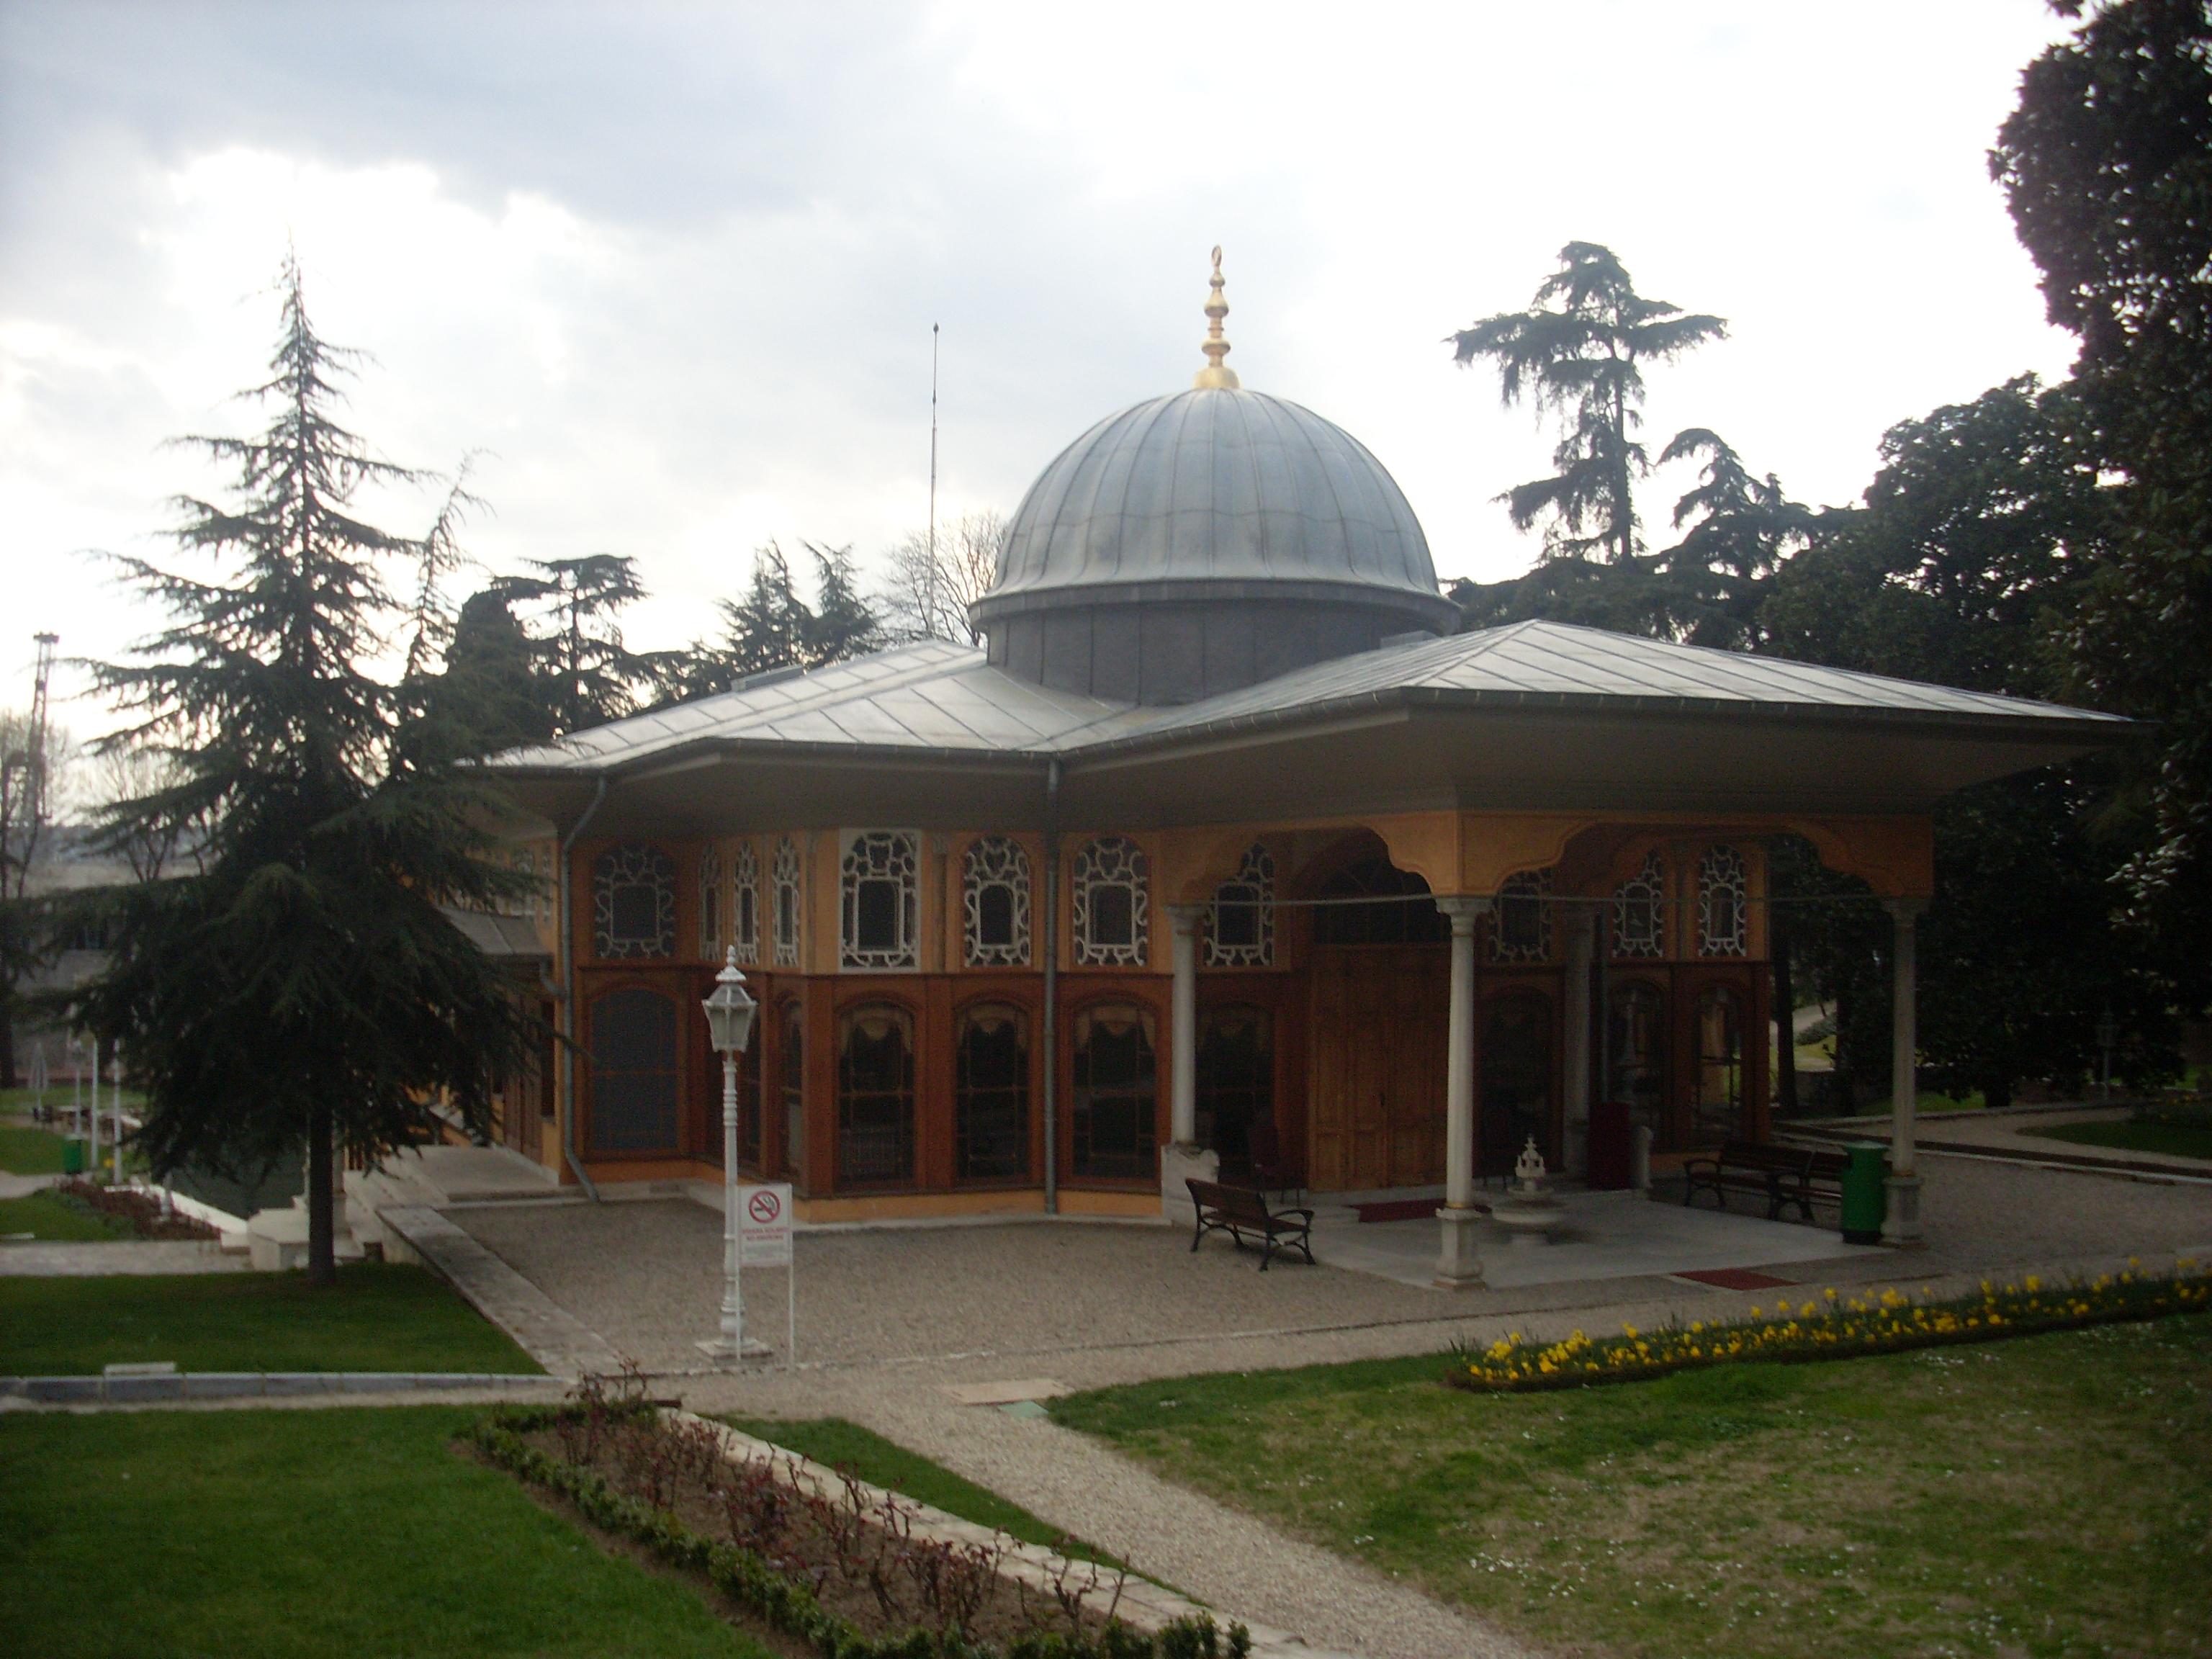 The garden of the Aynalıkavak Pavilion